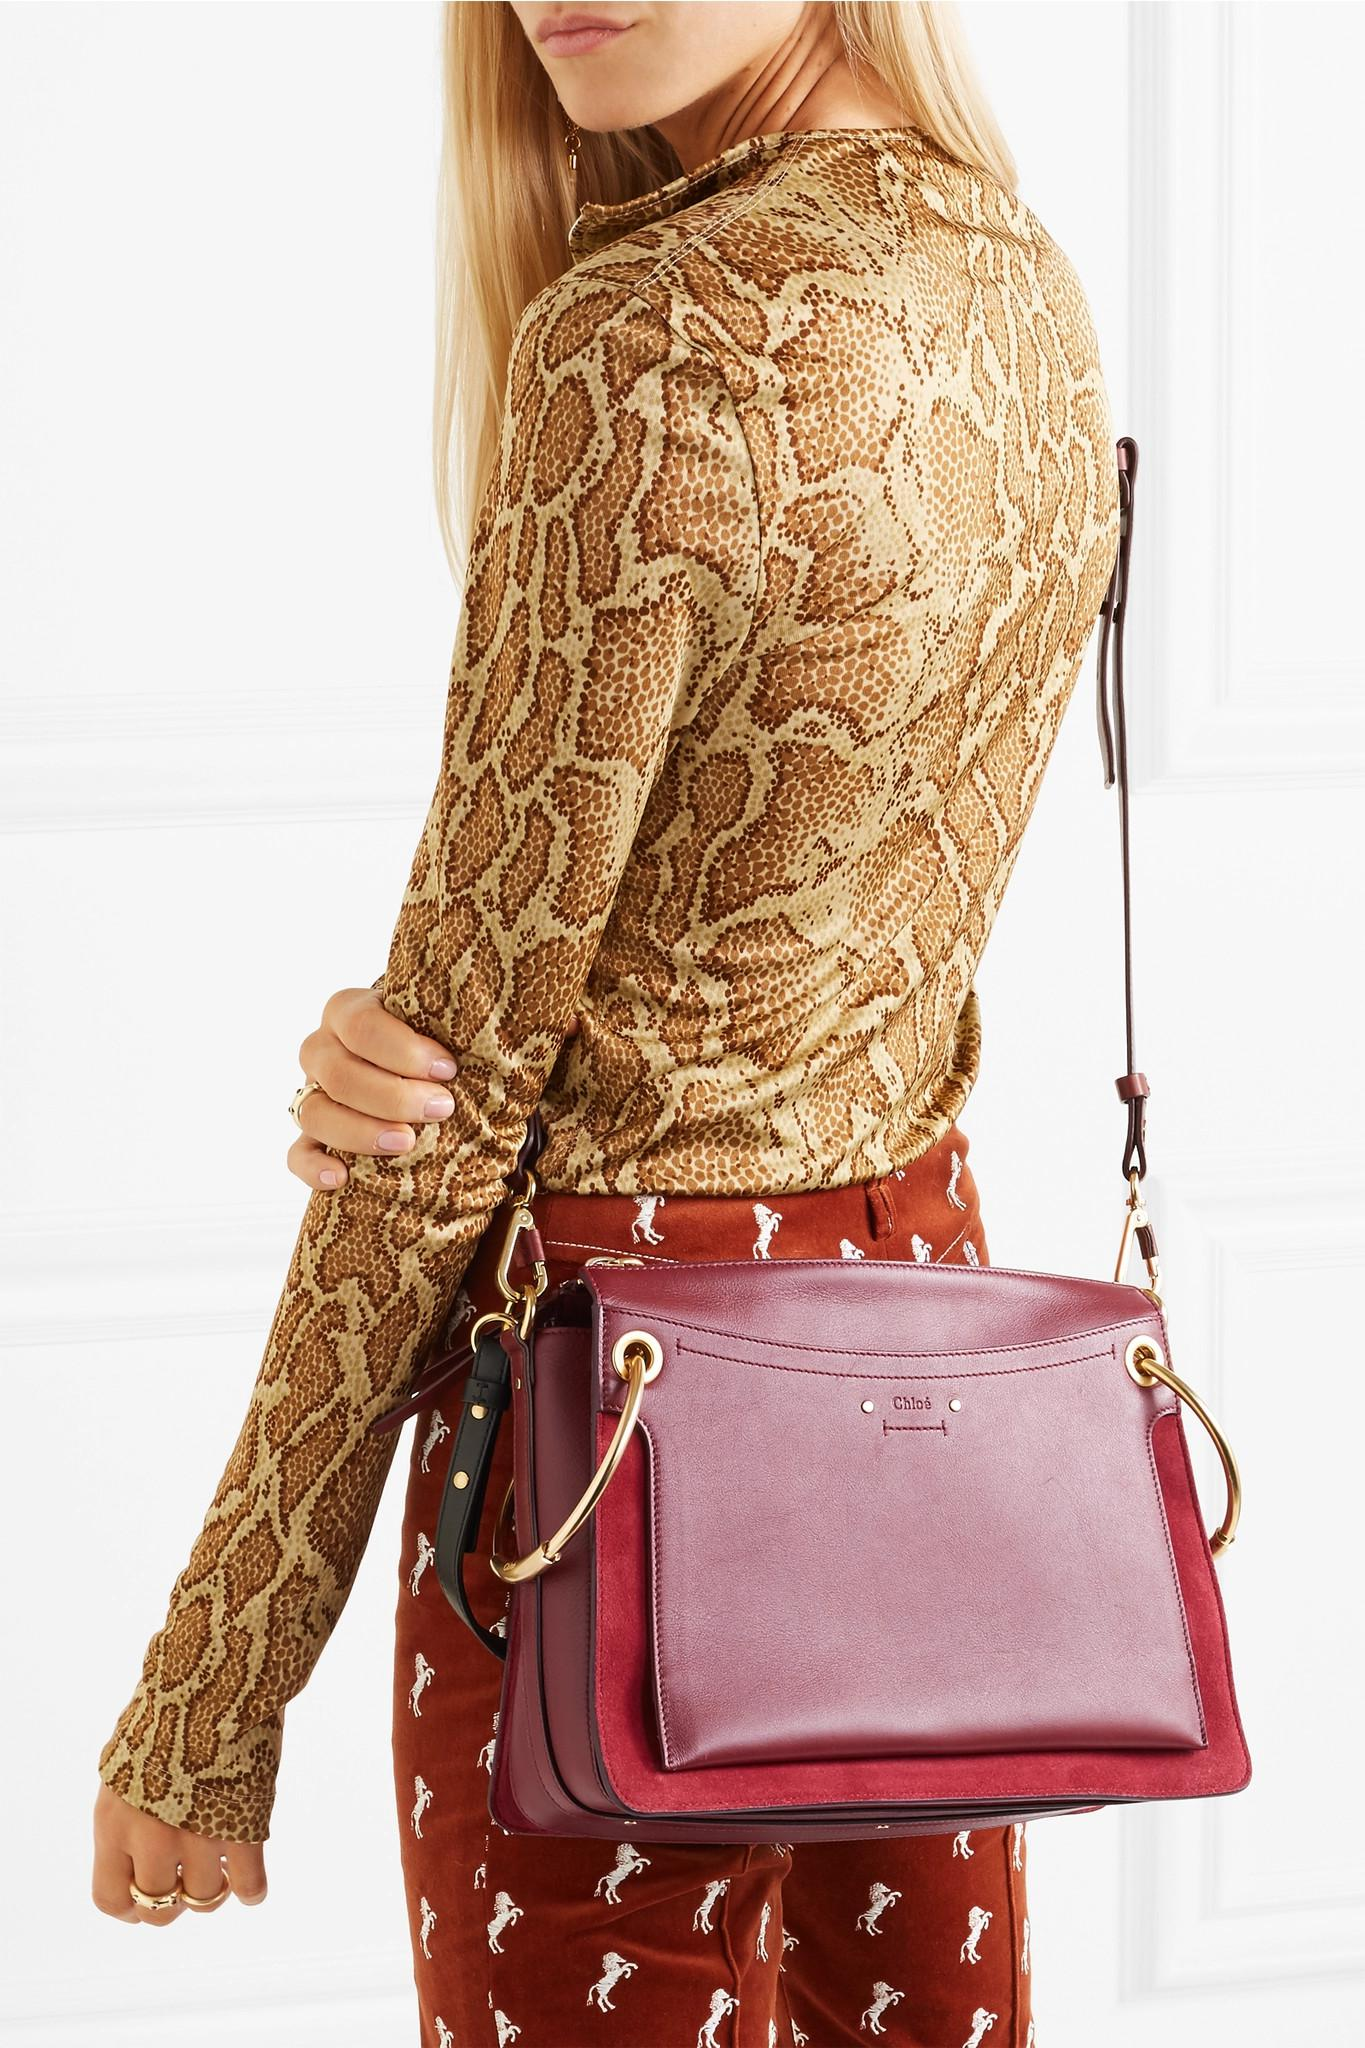 4870224b27 Lyst - Chloé Roy Medium Leather And Suede Shoulder Bag